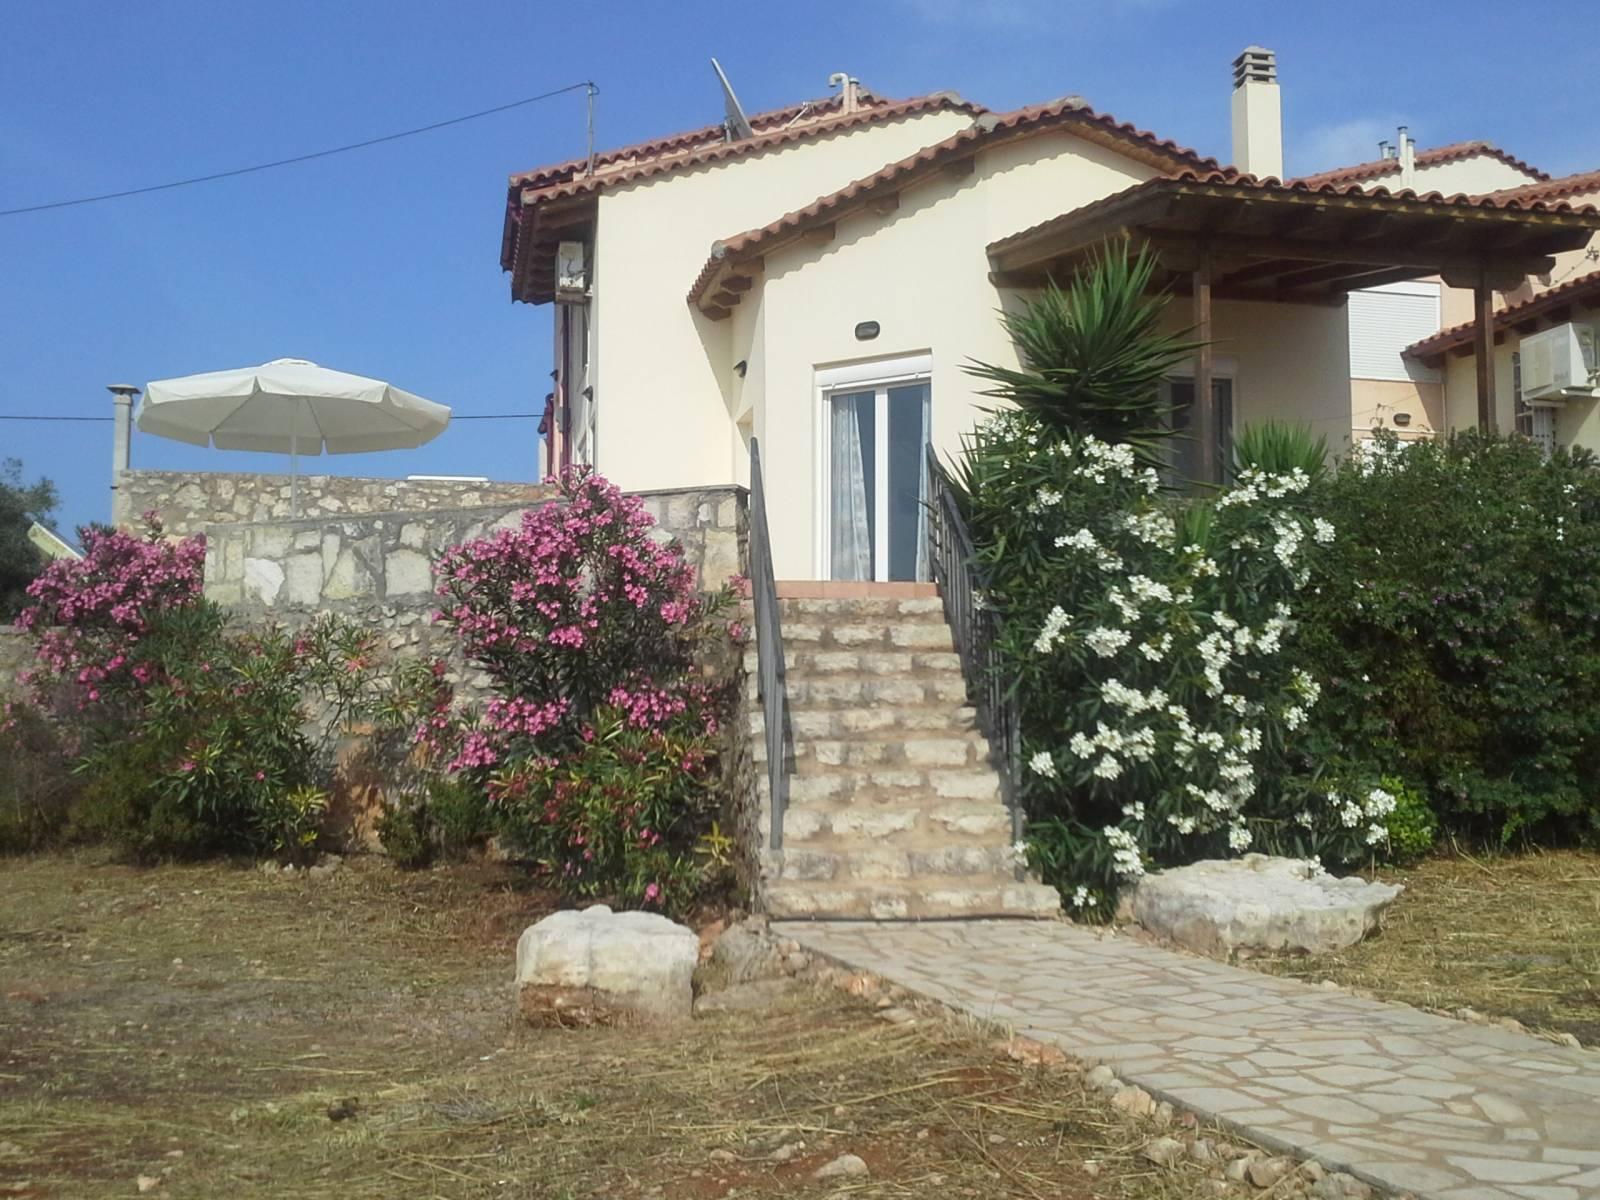 Talos village 2-bedroom house